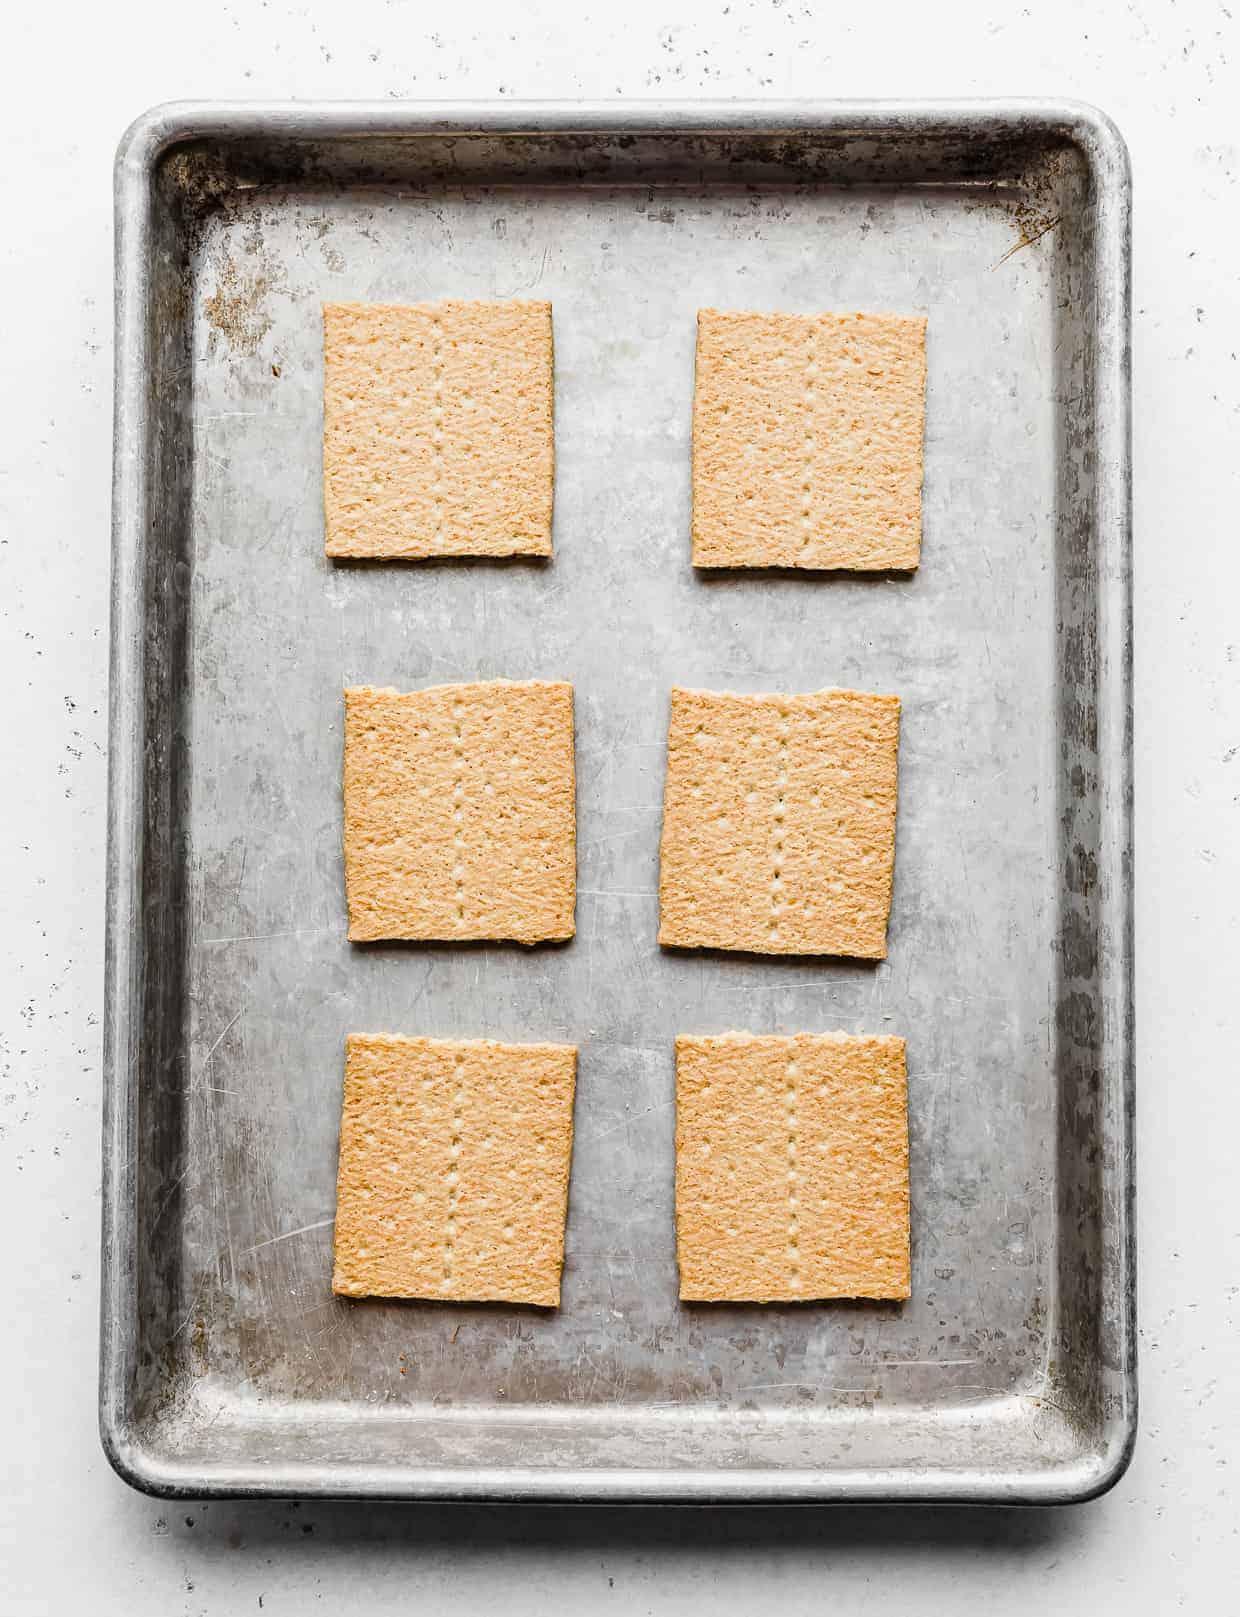 6 graham cracker squares on a baking sheet.